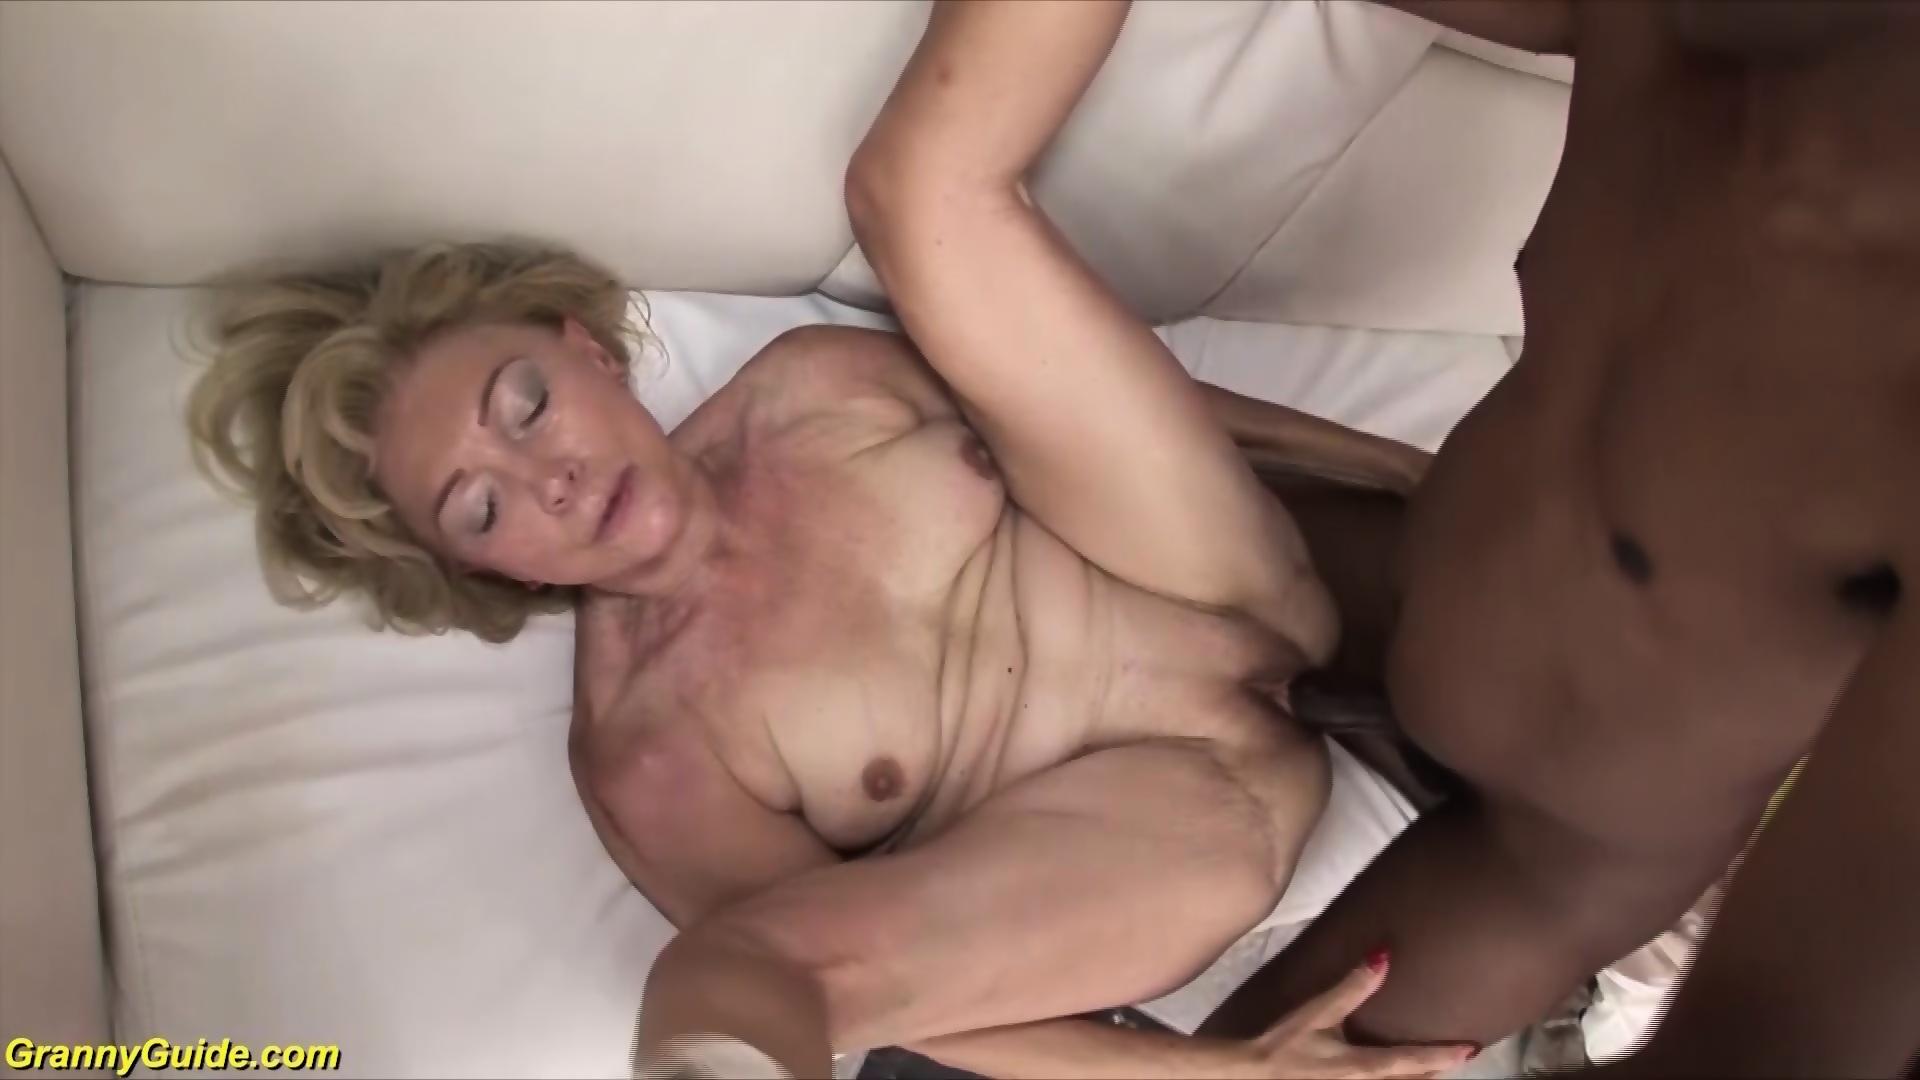 Watch the erotic traveler